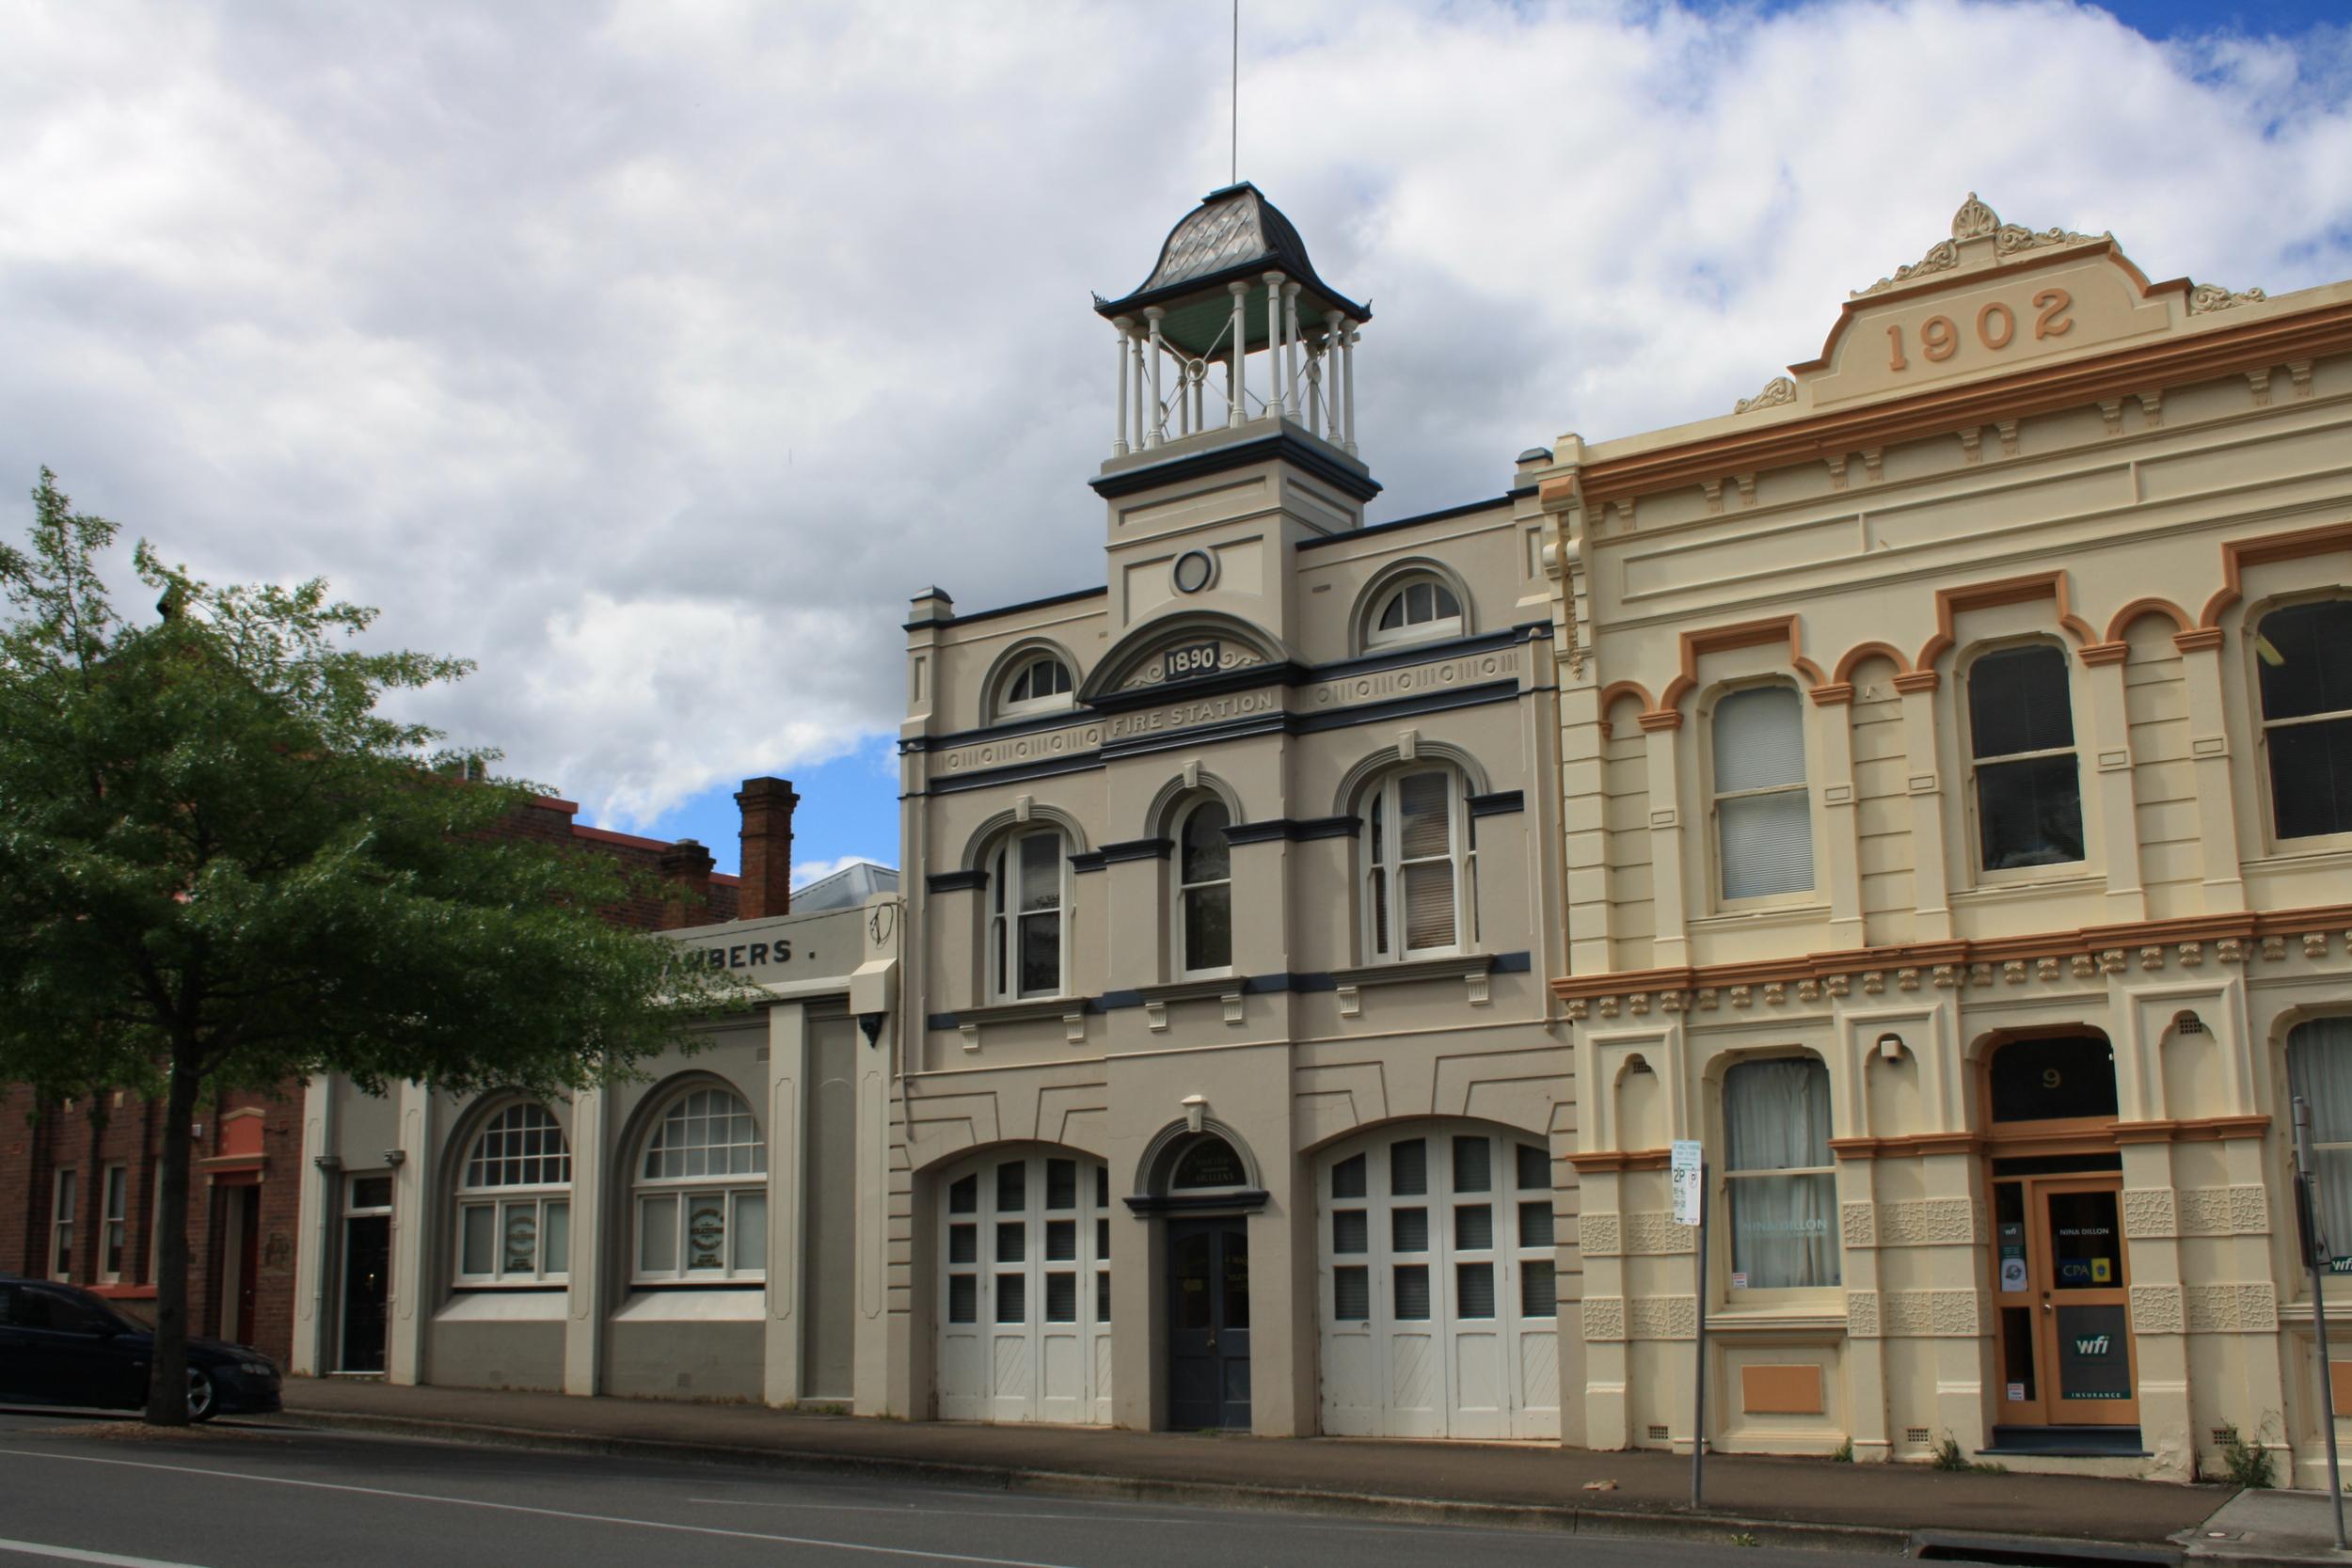 Andrew_Economos_Custom_Builder_Bowral_NSW_Australia_Restoration_2.JPG